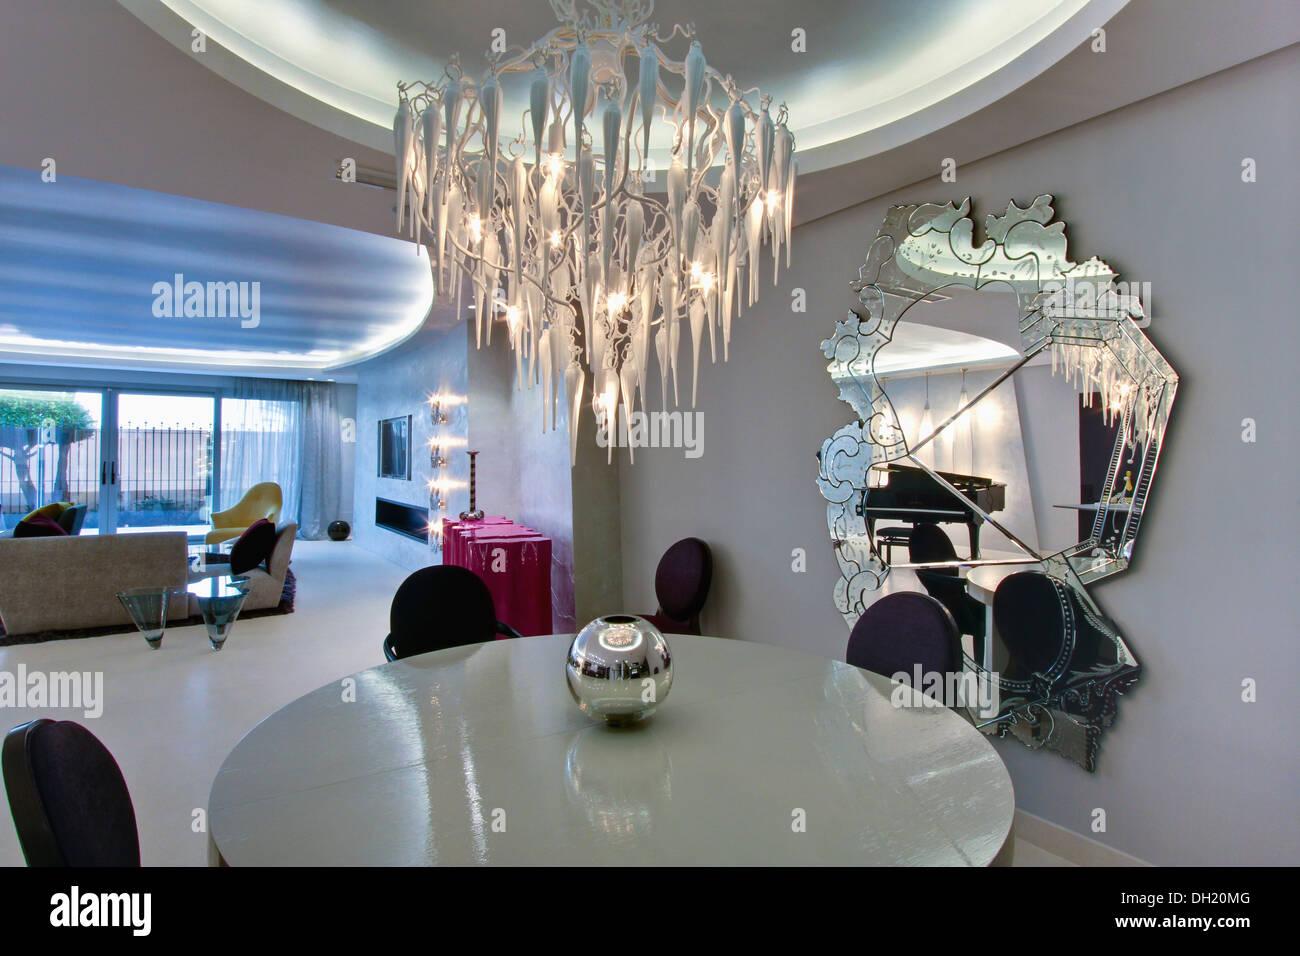 Apartment Chandelier Led Kitchen Ceiling Lighting Uk